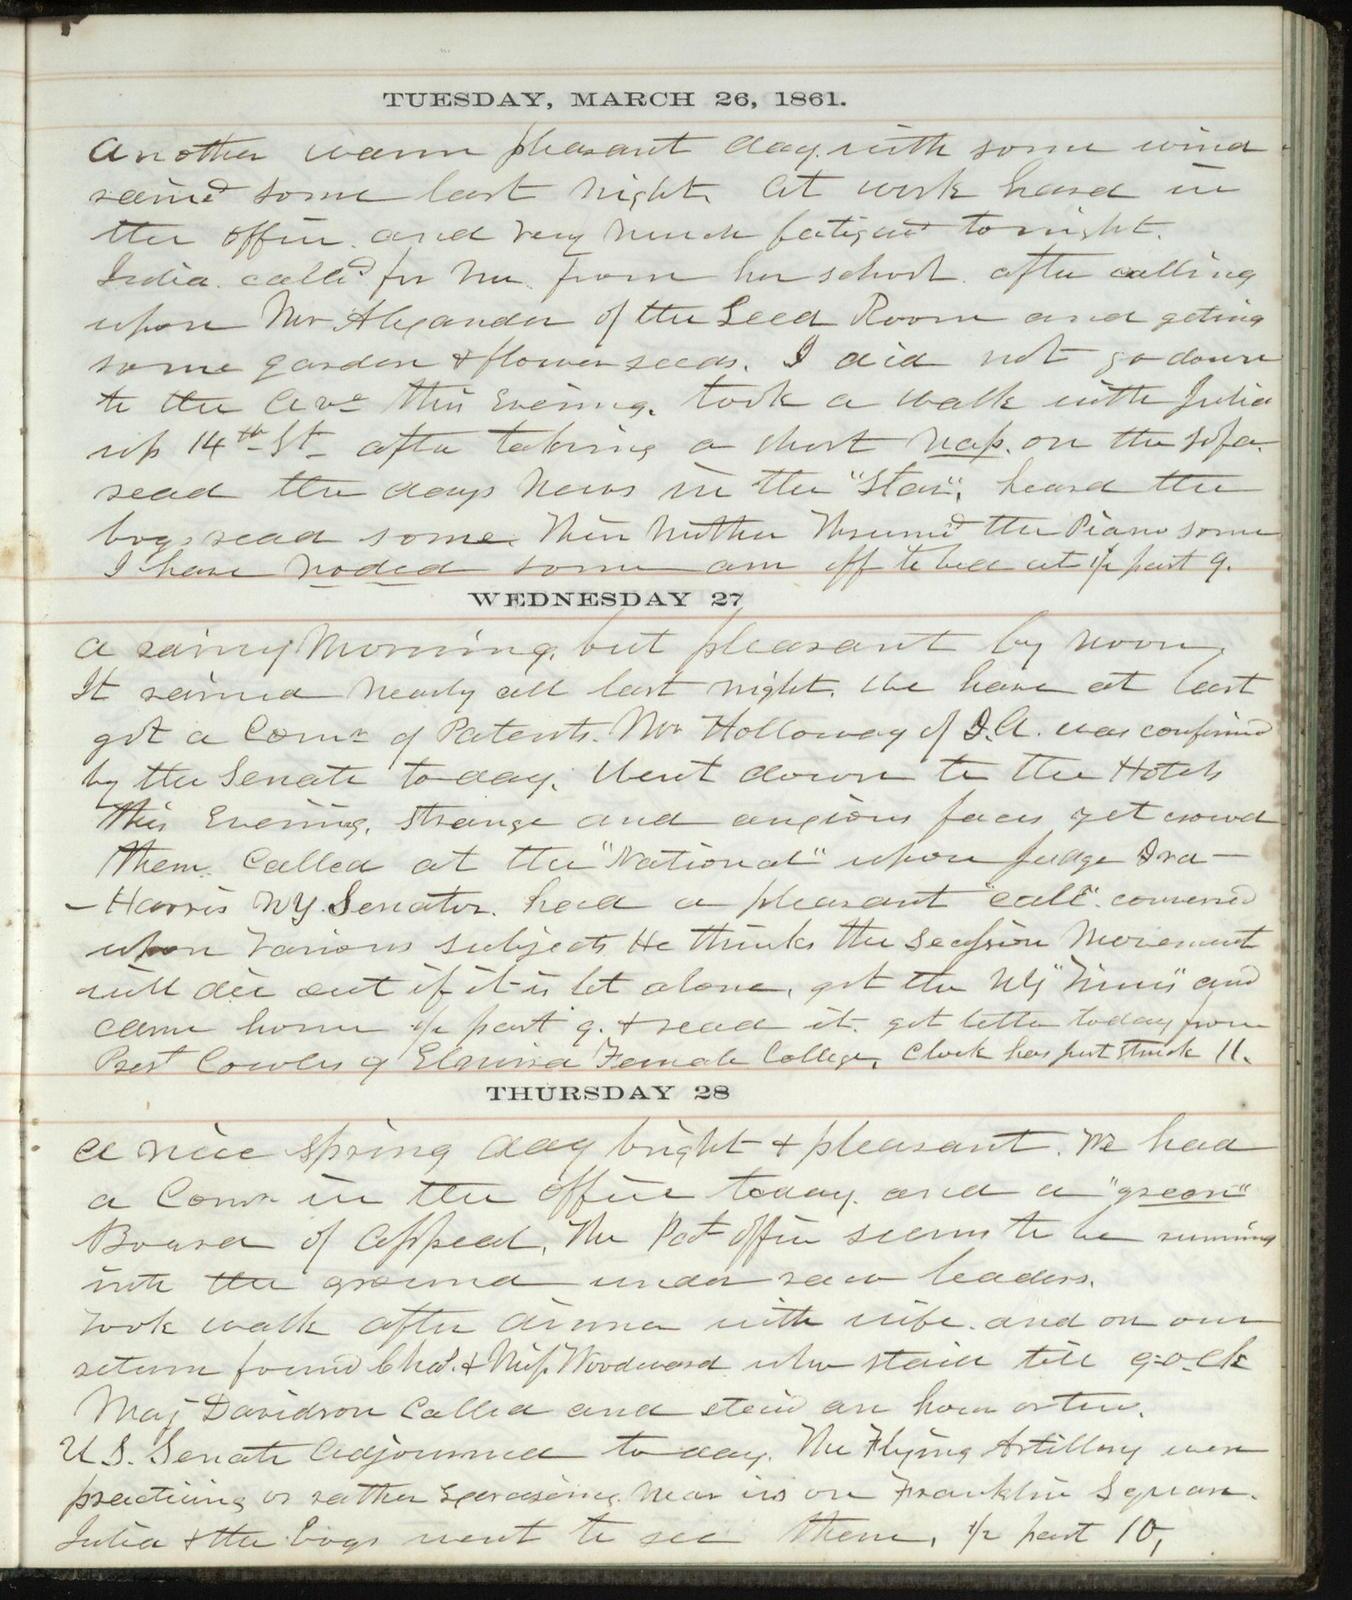 The Diary of Horatio Nelson Taft, 1861-1865. Volume 1, January 1,1861-April 11, 1862